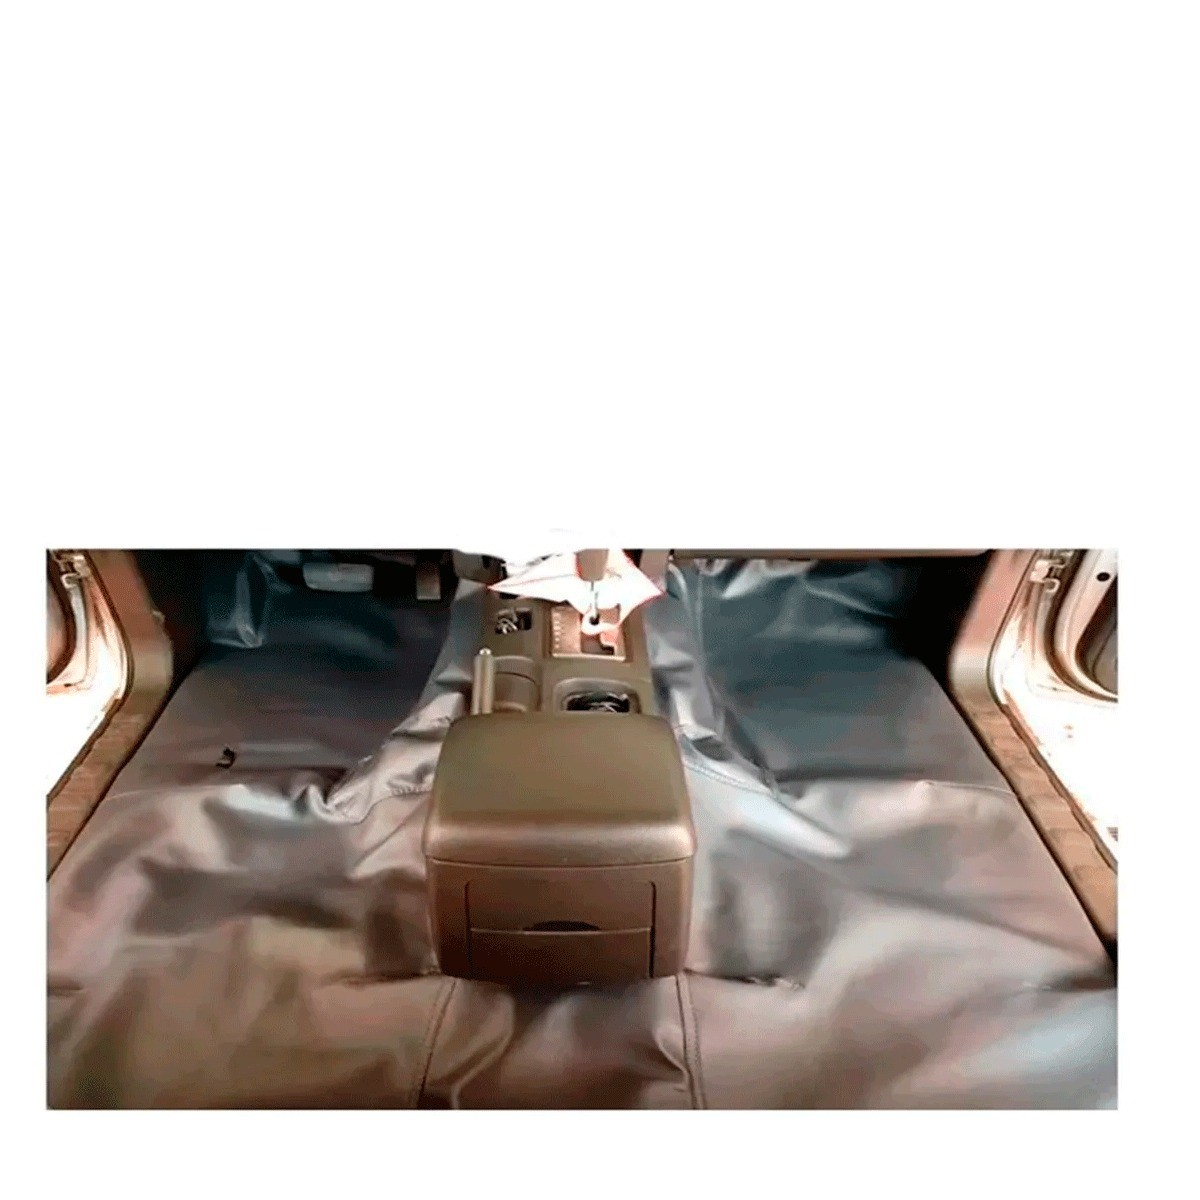 Tapete Automotivo Assoalho Emborrachado Bidim Ford Ká 2008 a 2013